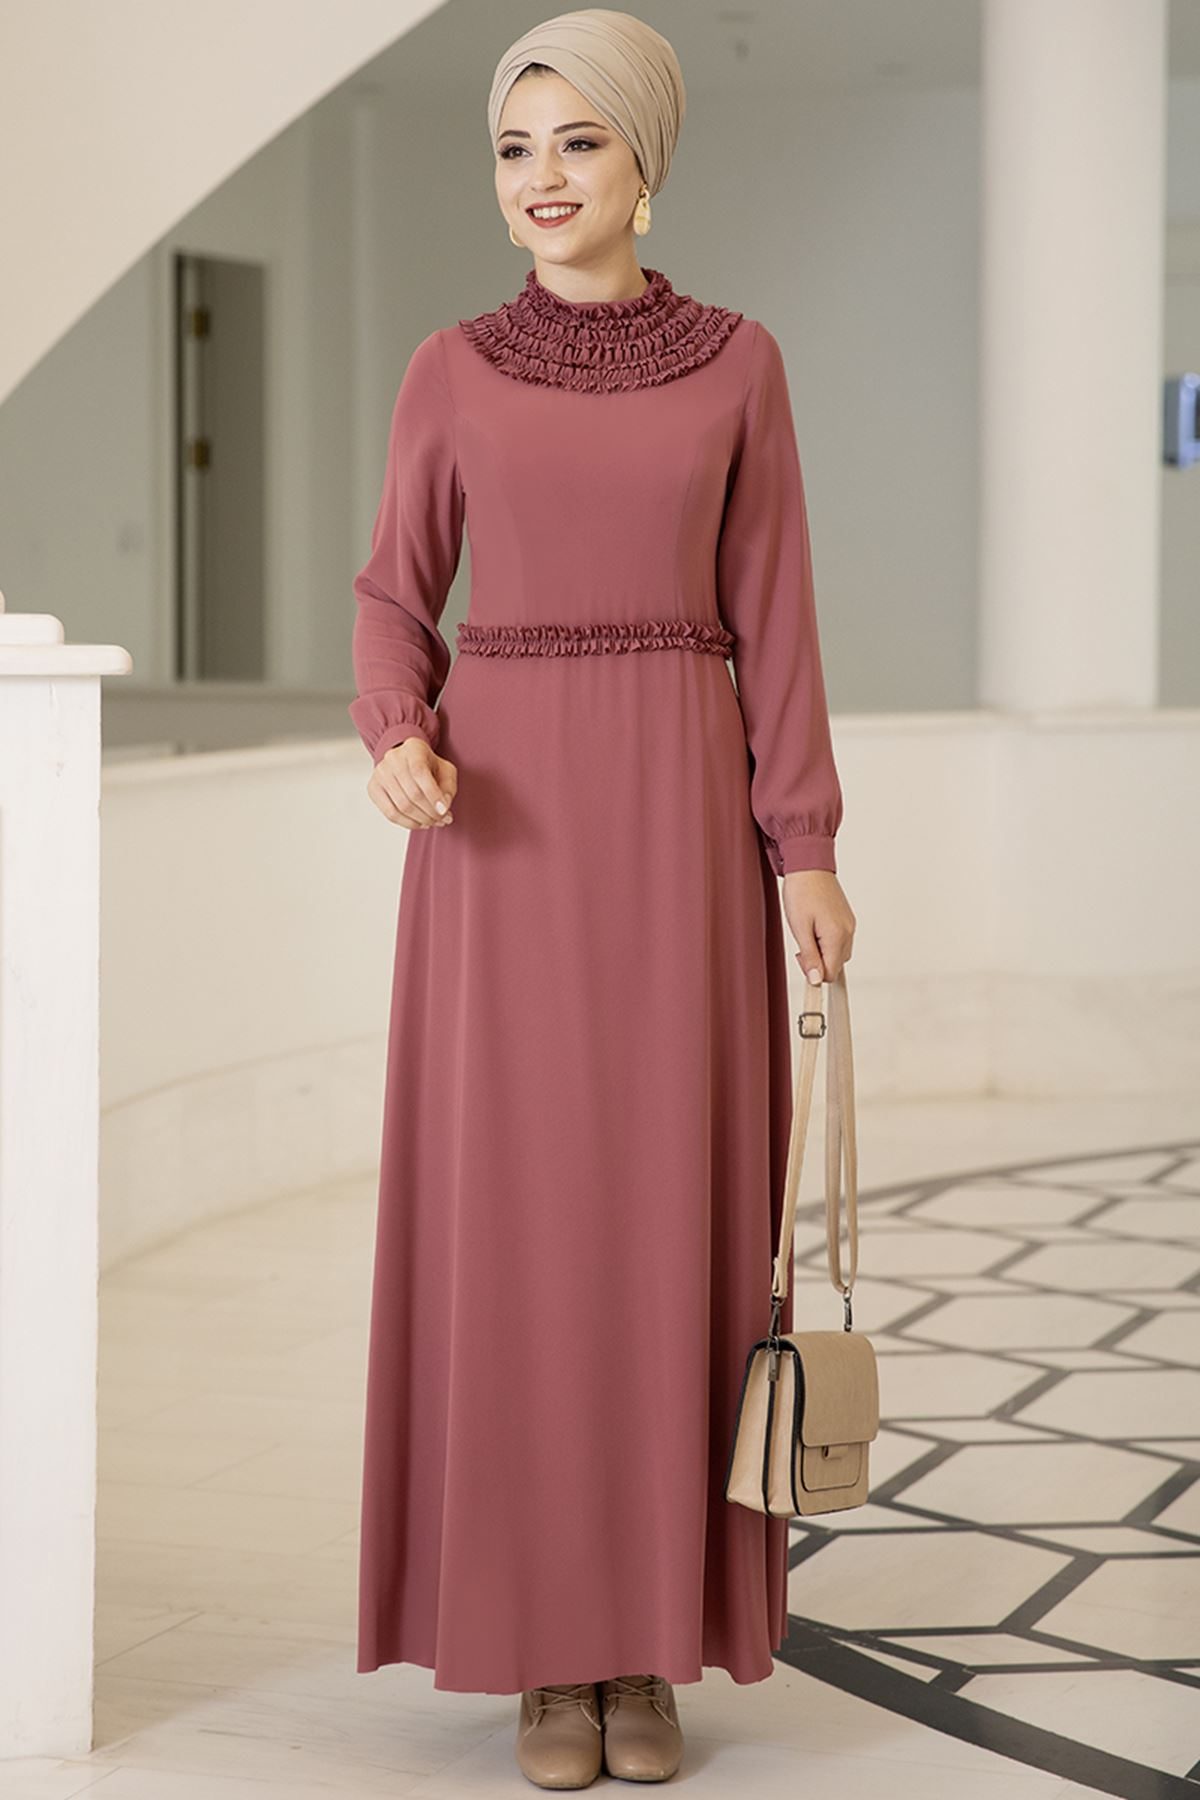 Dresslife Eslem Elbise Gül Kurusu DRE2010